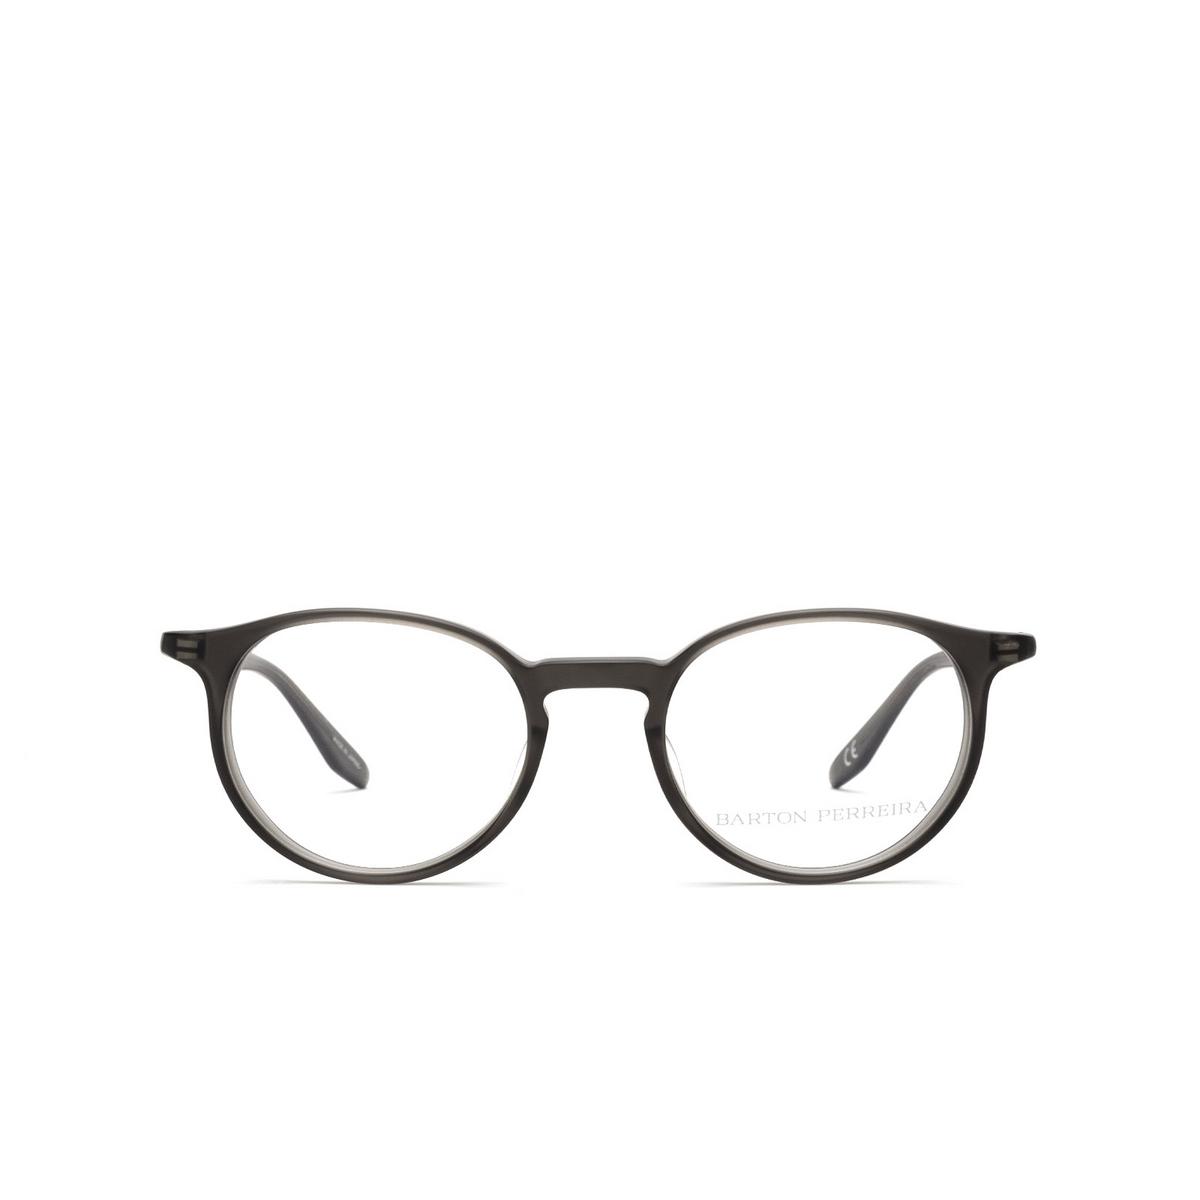 Barton Perreira® Round Eyeglasses: Norton BP5043 color Matte Dusk 1KV - front view.